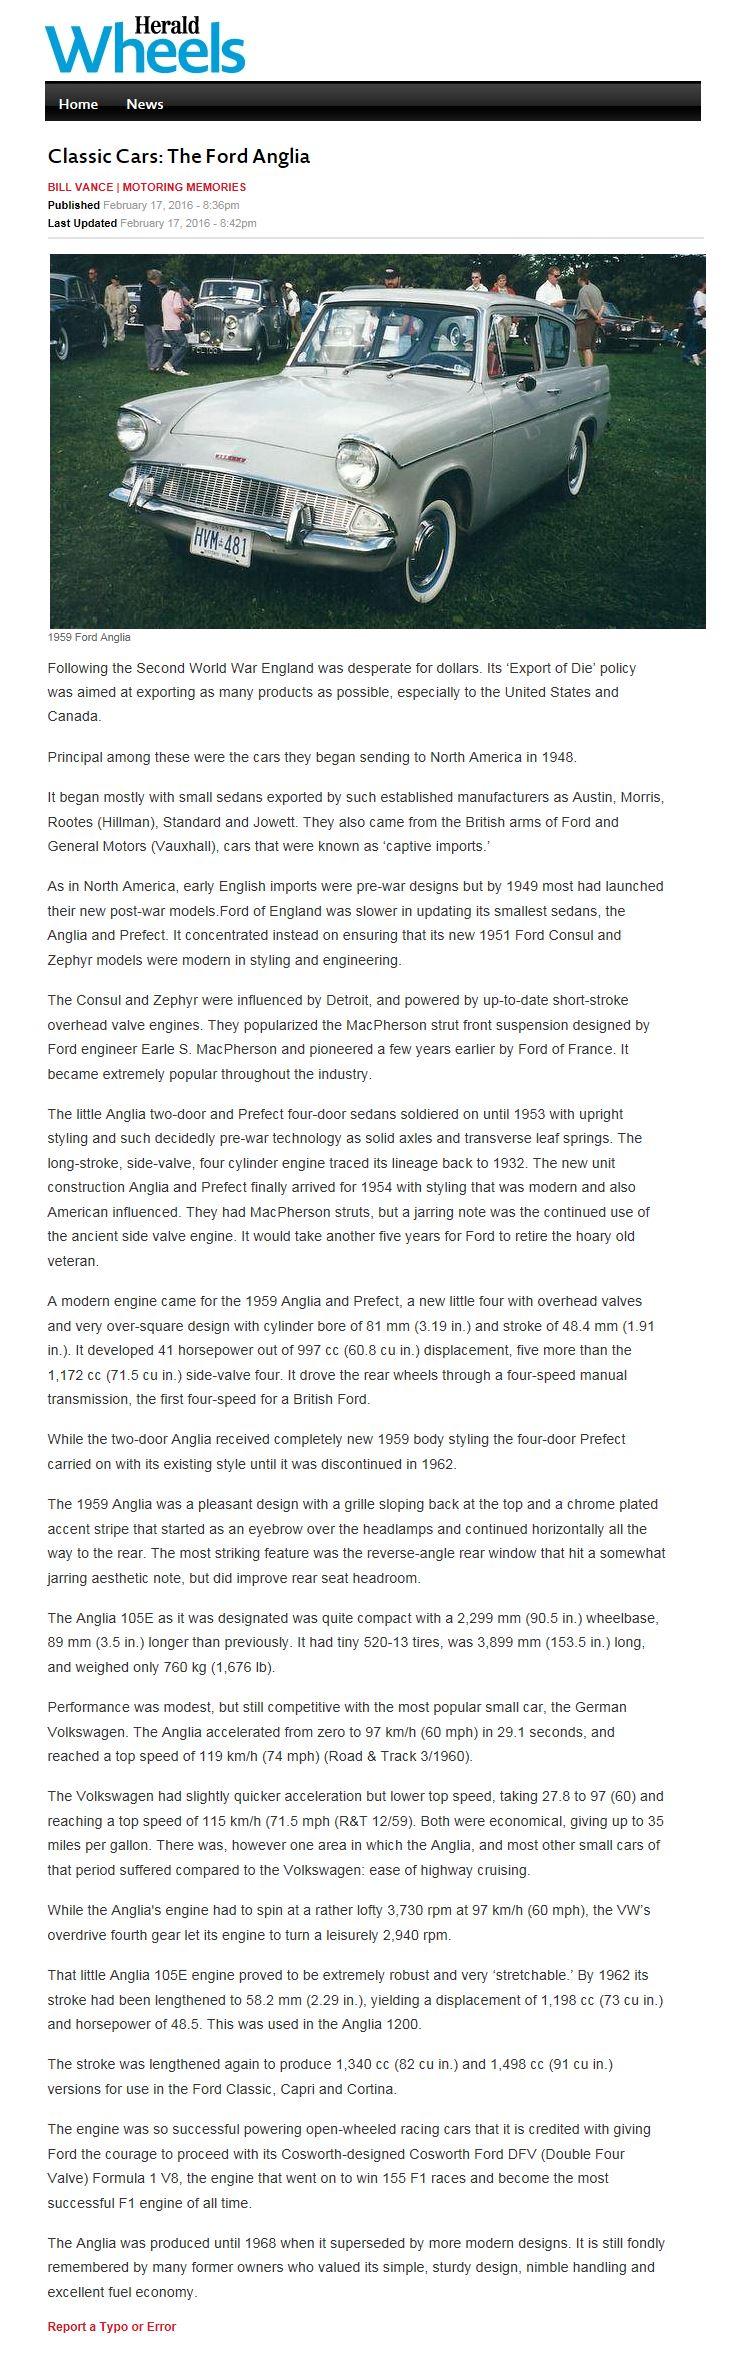 Ford Anglia 105e Saloon Article No 68